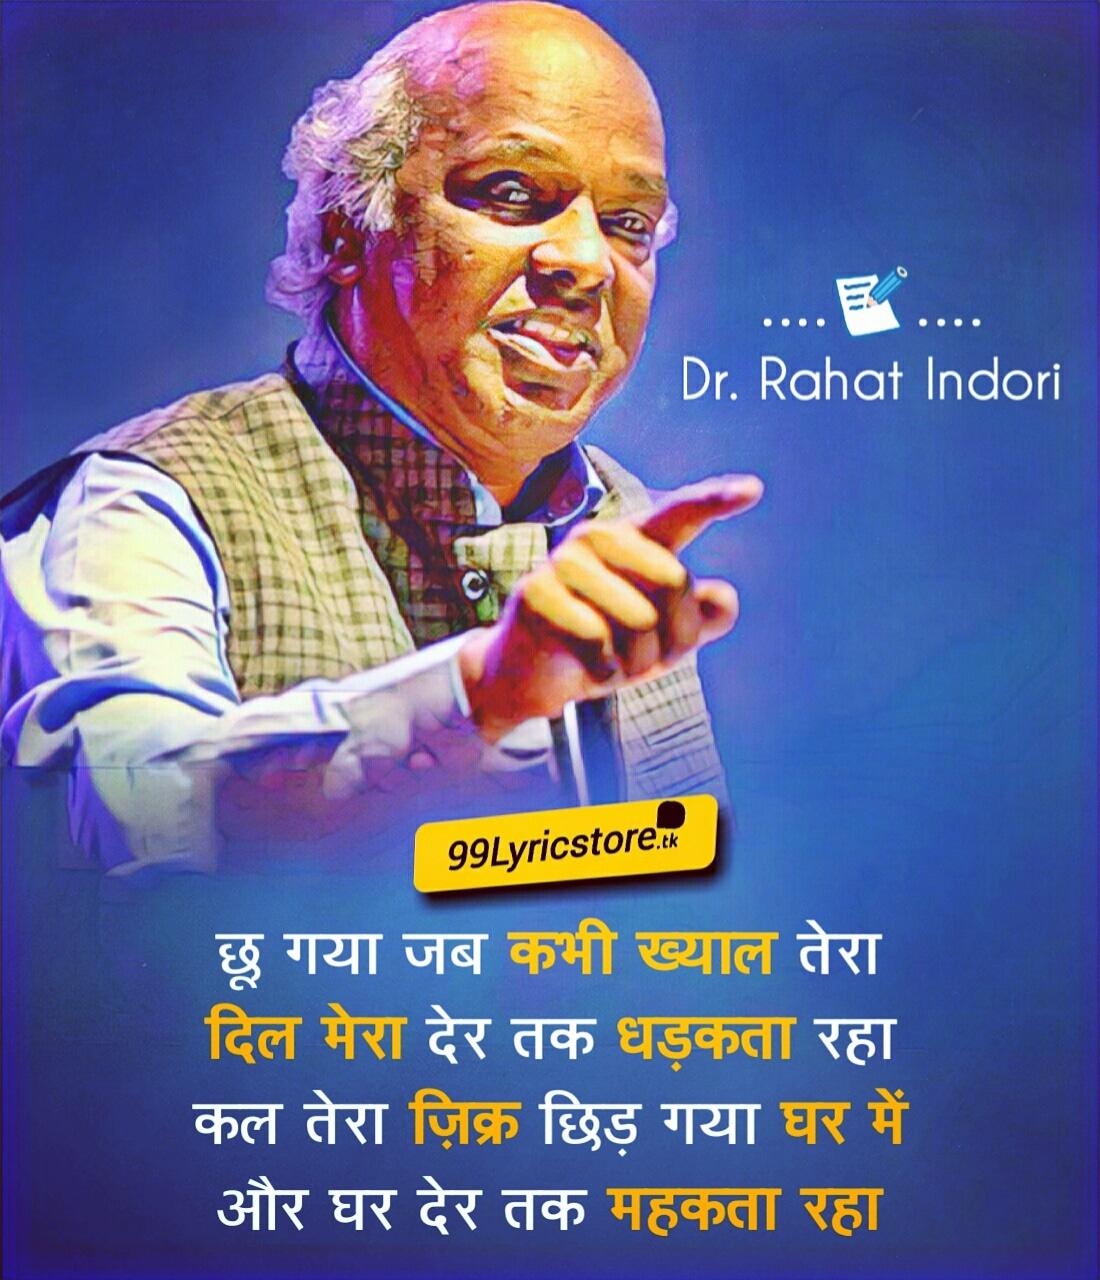 Chhu Gaya Jab Kabhi Khayal Tera  written and performed by Rahat Indori. This poetry is best Ghazal And Shayari of Rahat Indori.